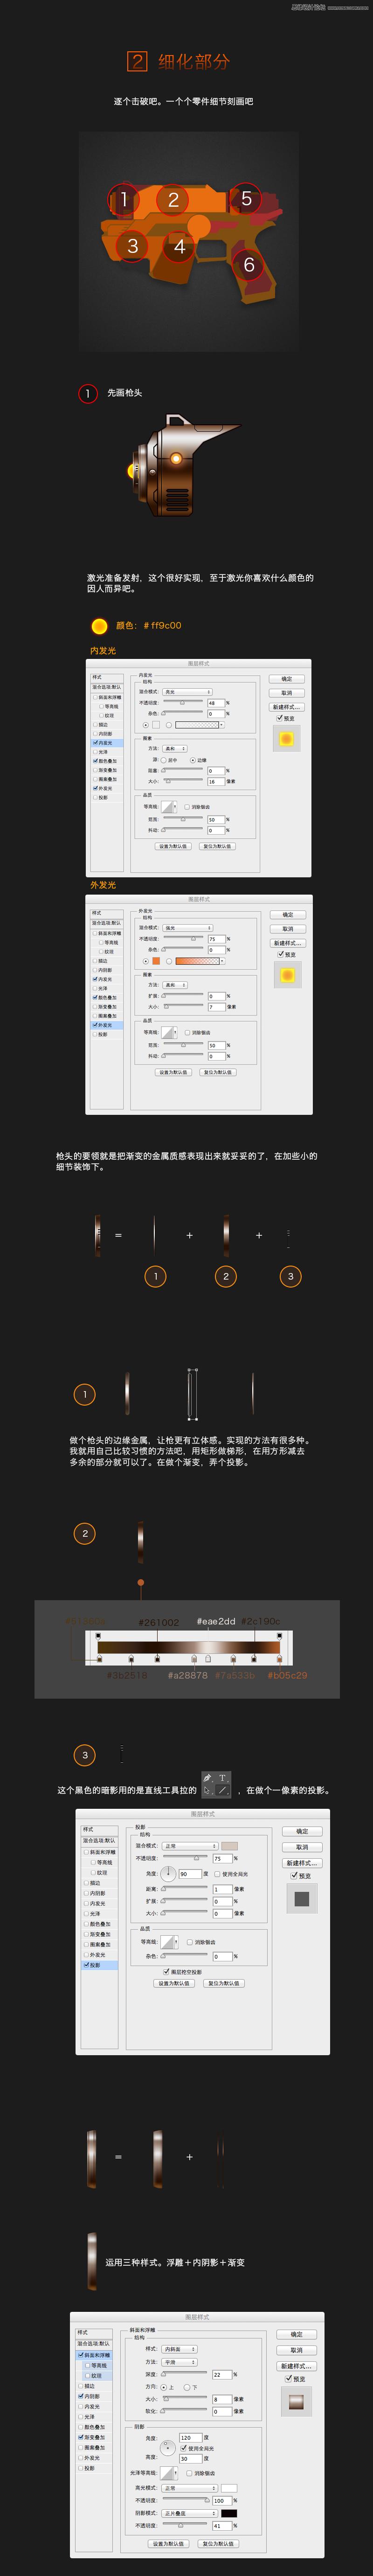 Photoshop鼠绘绘制科幻电影中的手枪效果图